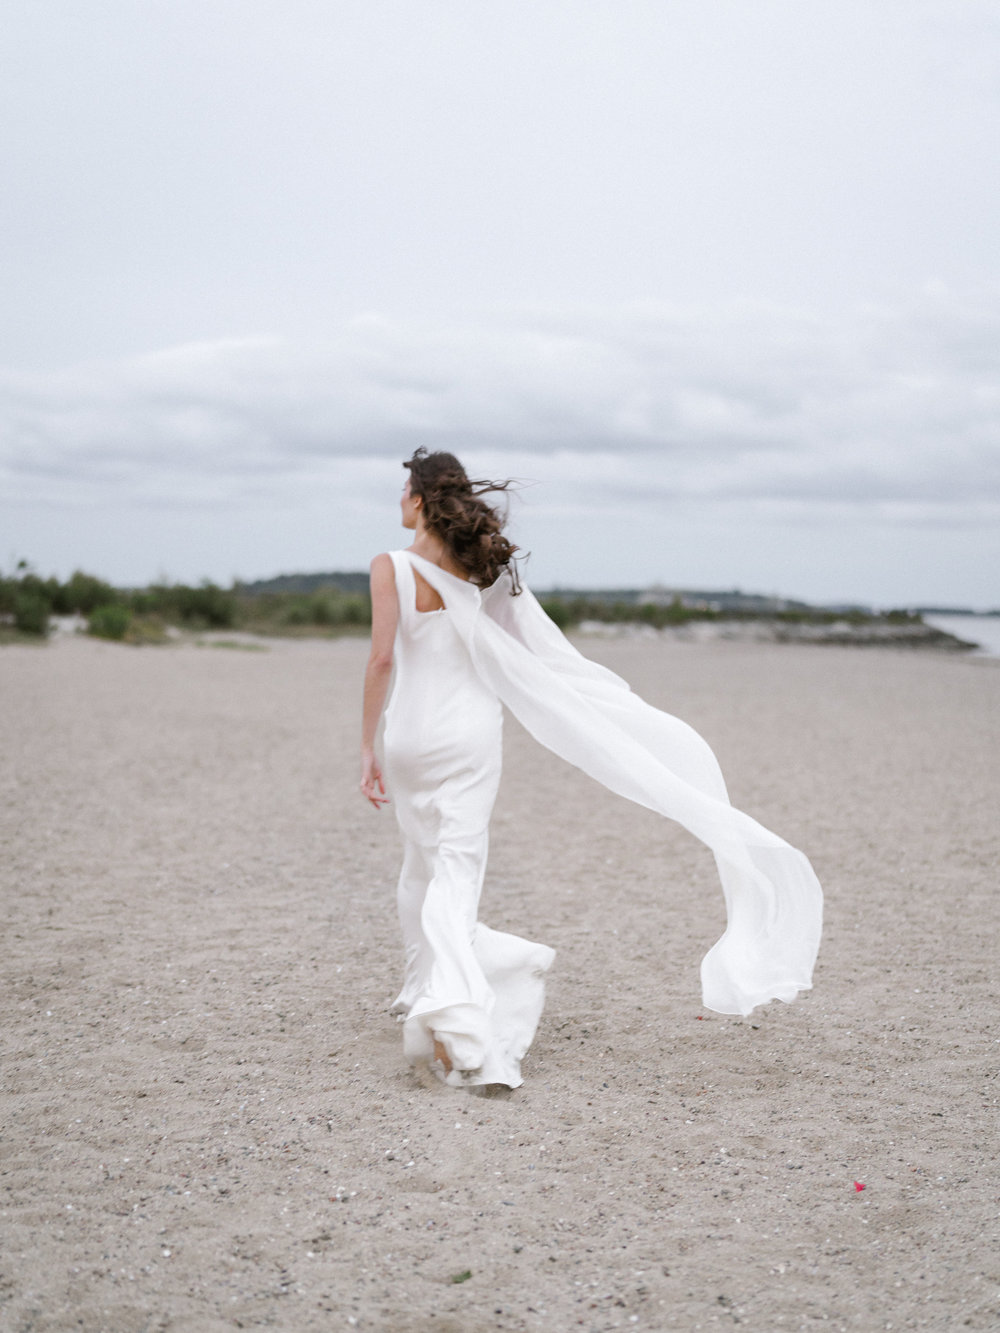 hannah-cochran-photography-bridal-styled-shoot-sep-8-160.jpg